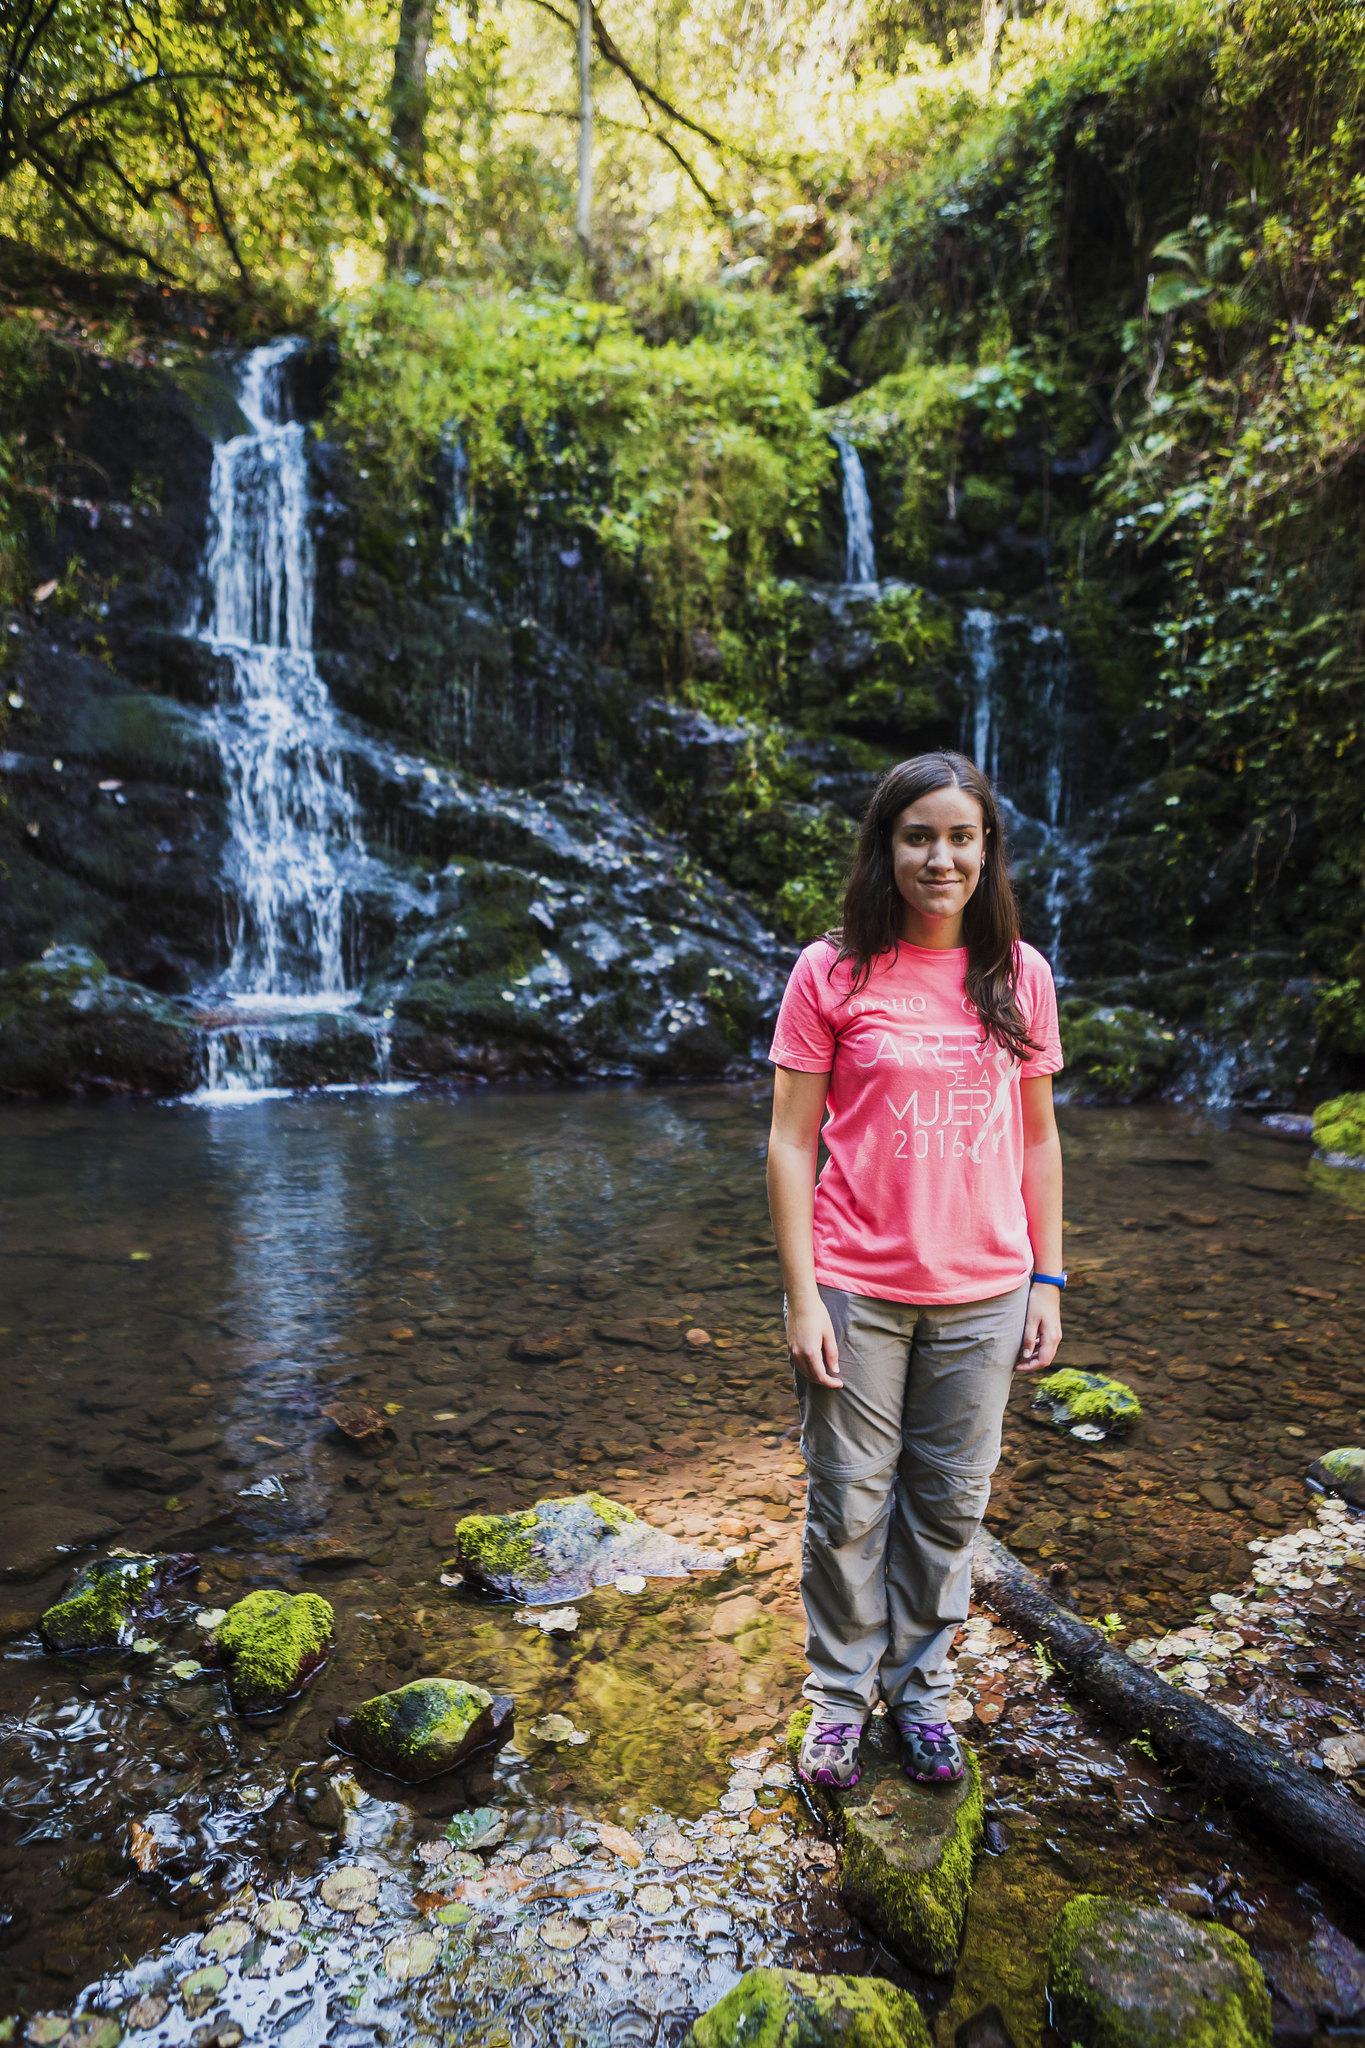 Frente a la cascada